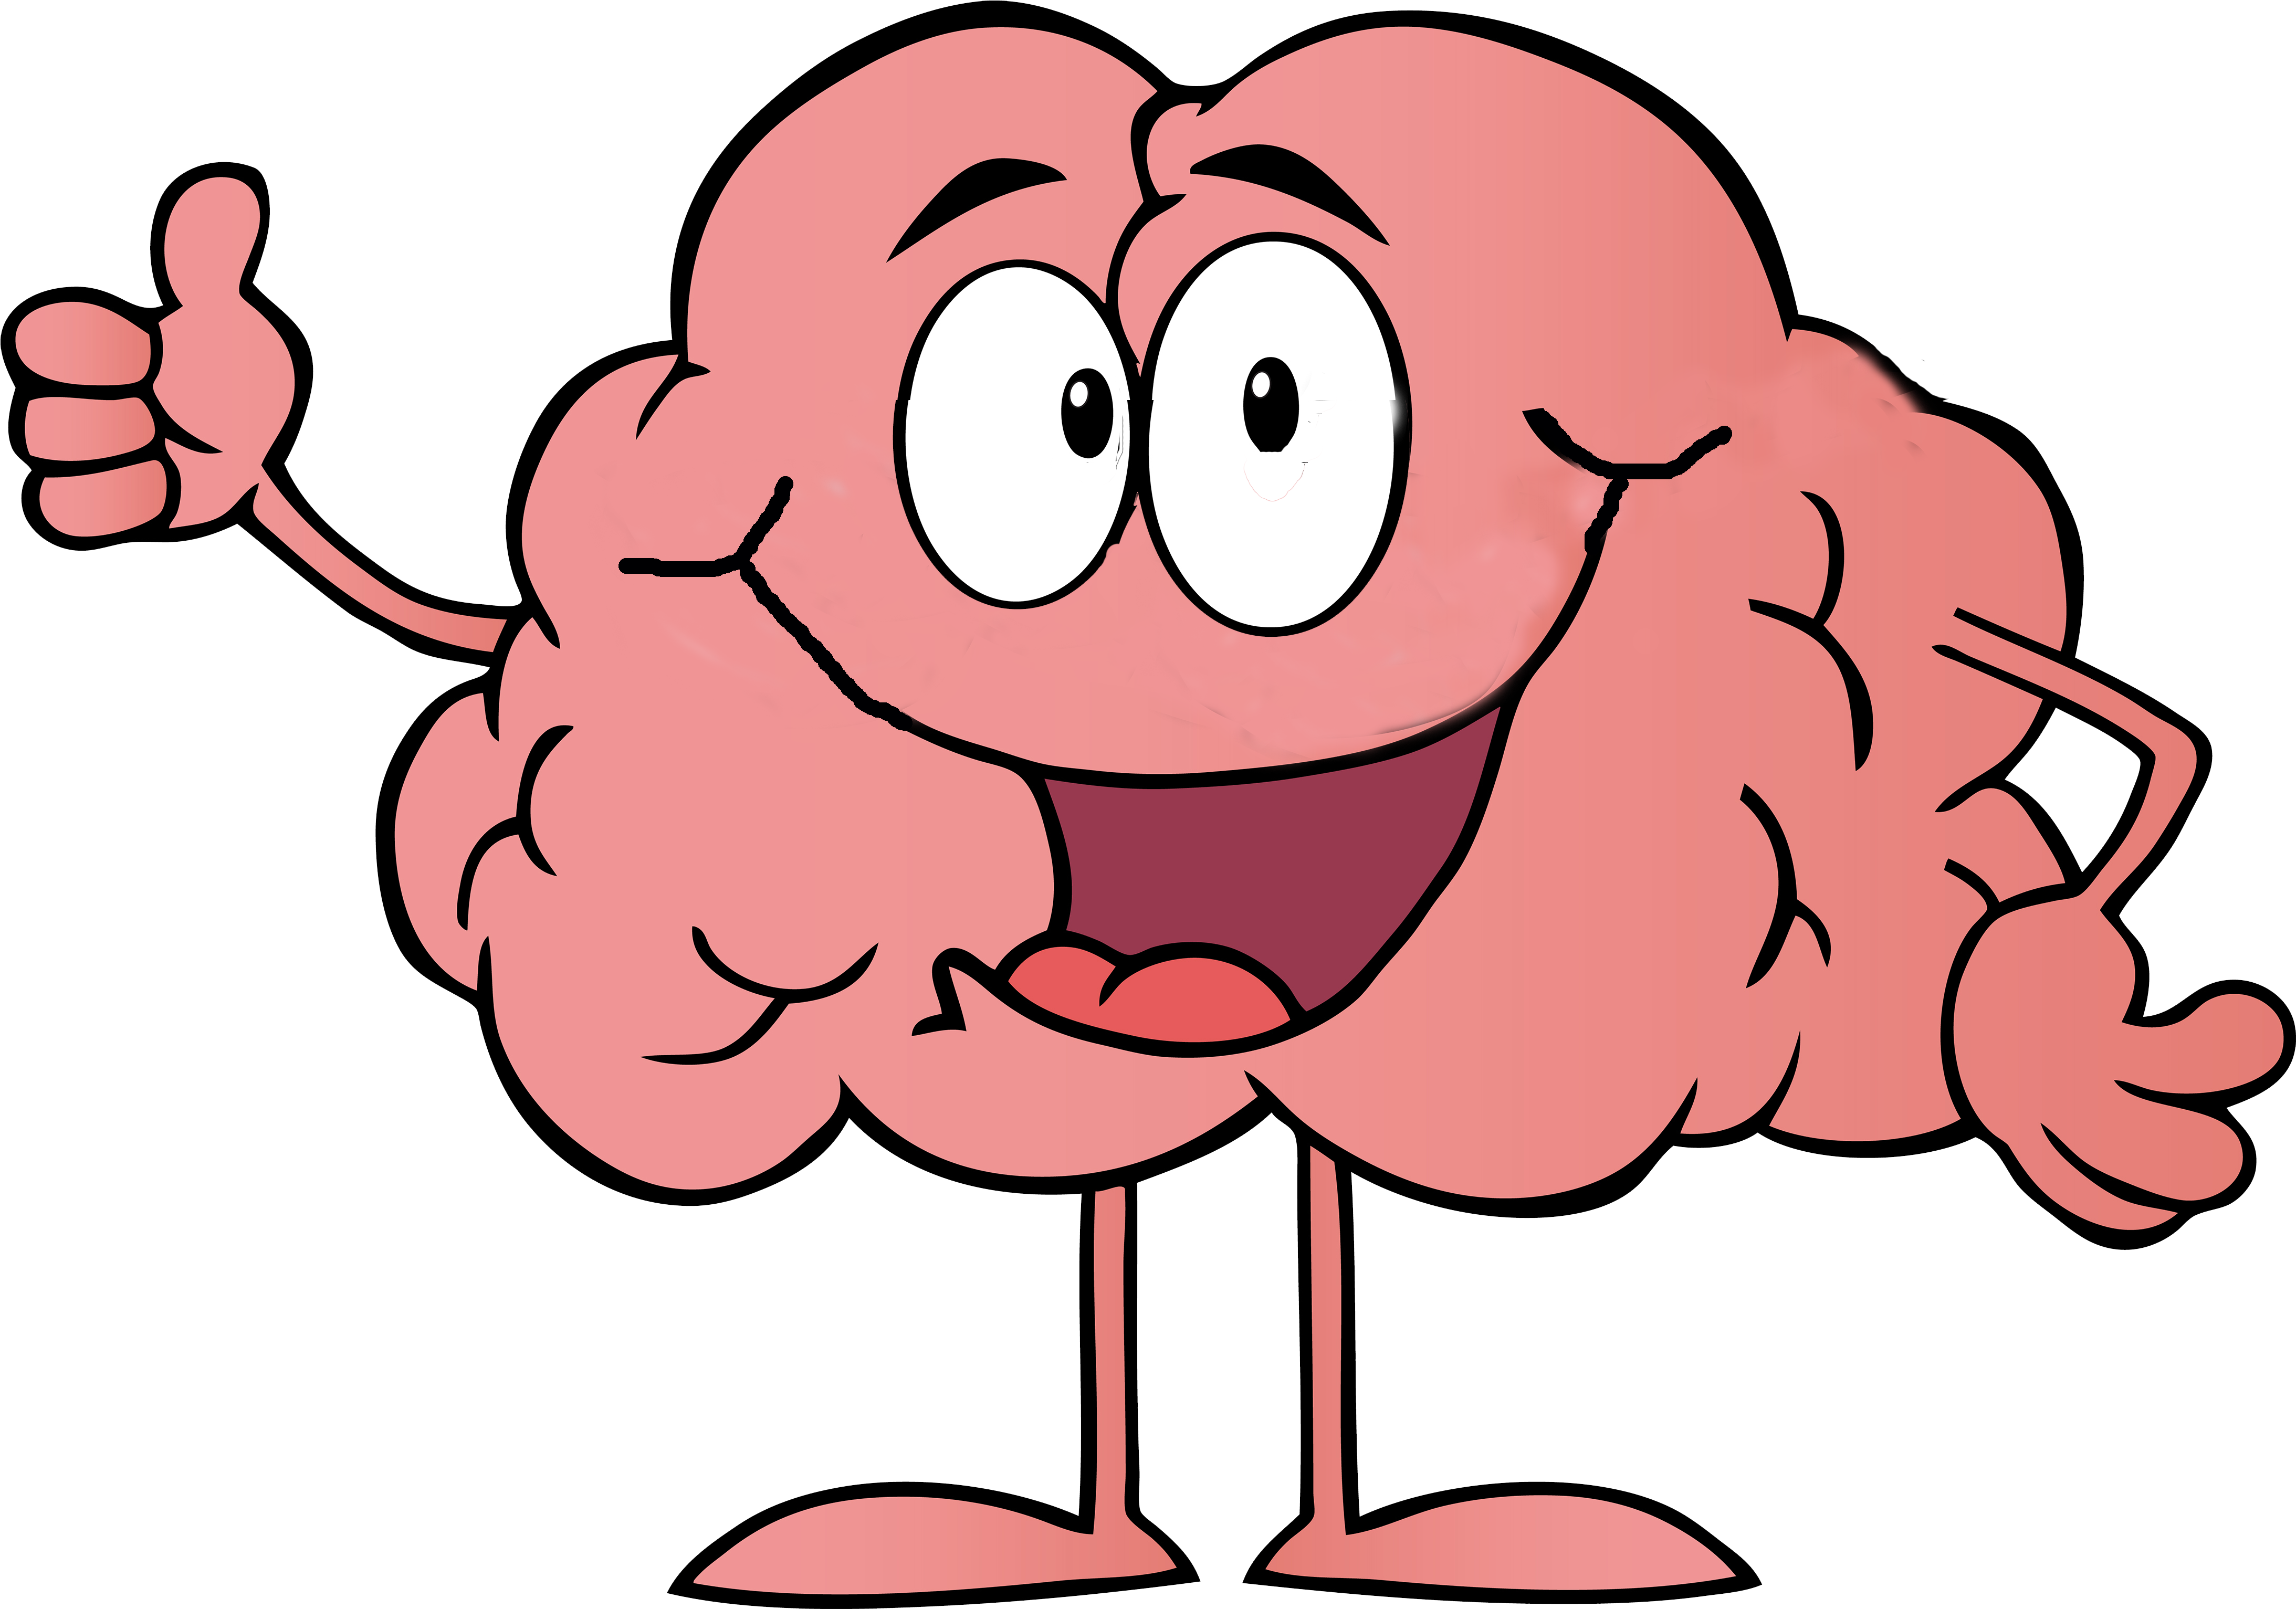 brain clip art png cartoon brain png brain cartoon transparent background 1059293 vippng brain clip art png cartoon brain png